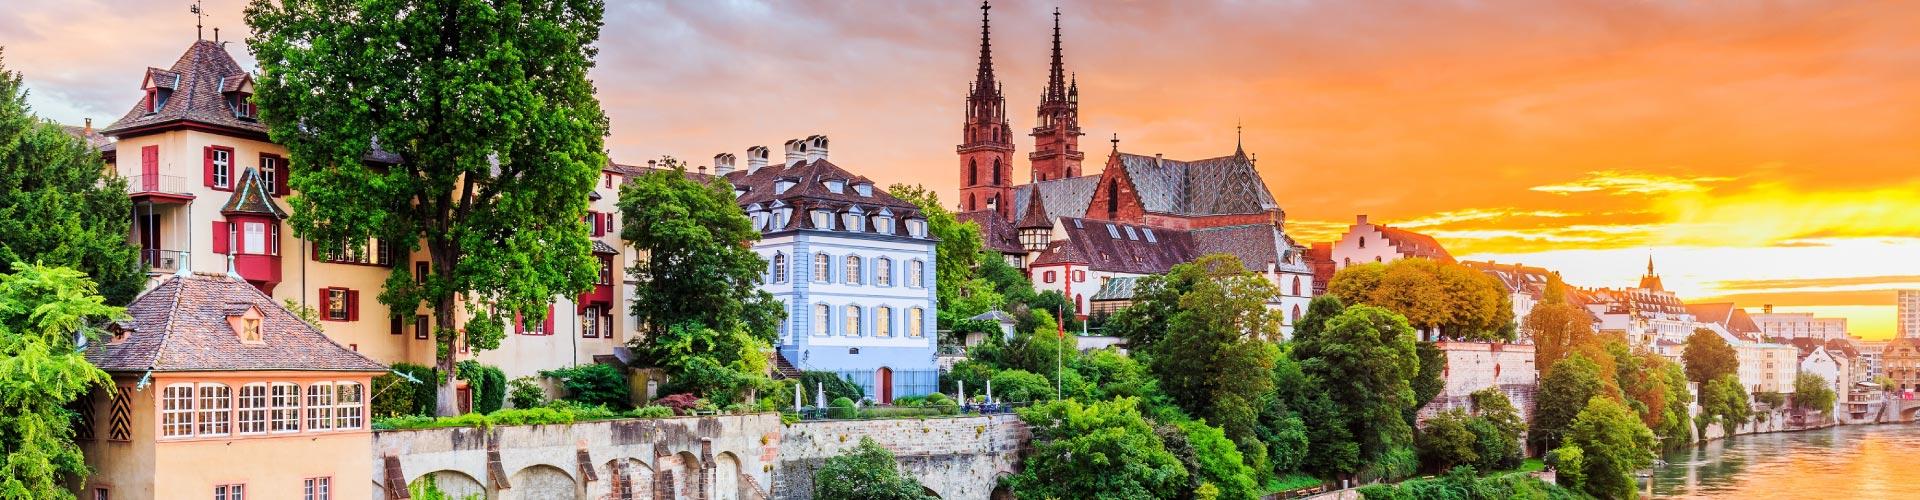 Legendary Rhine - Basel To Amsterdam (Crystal Cruise)